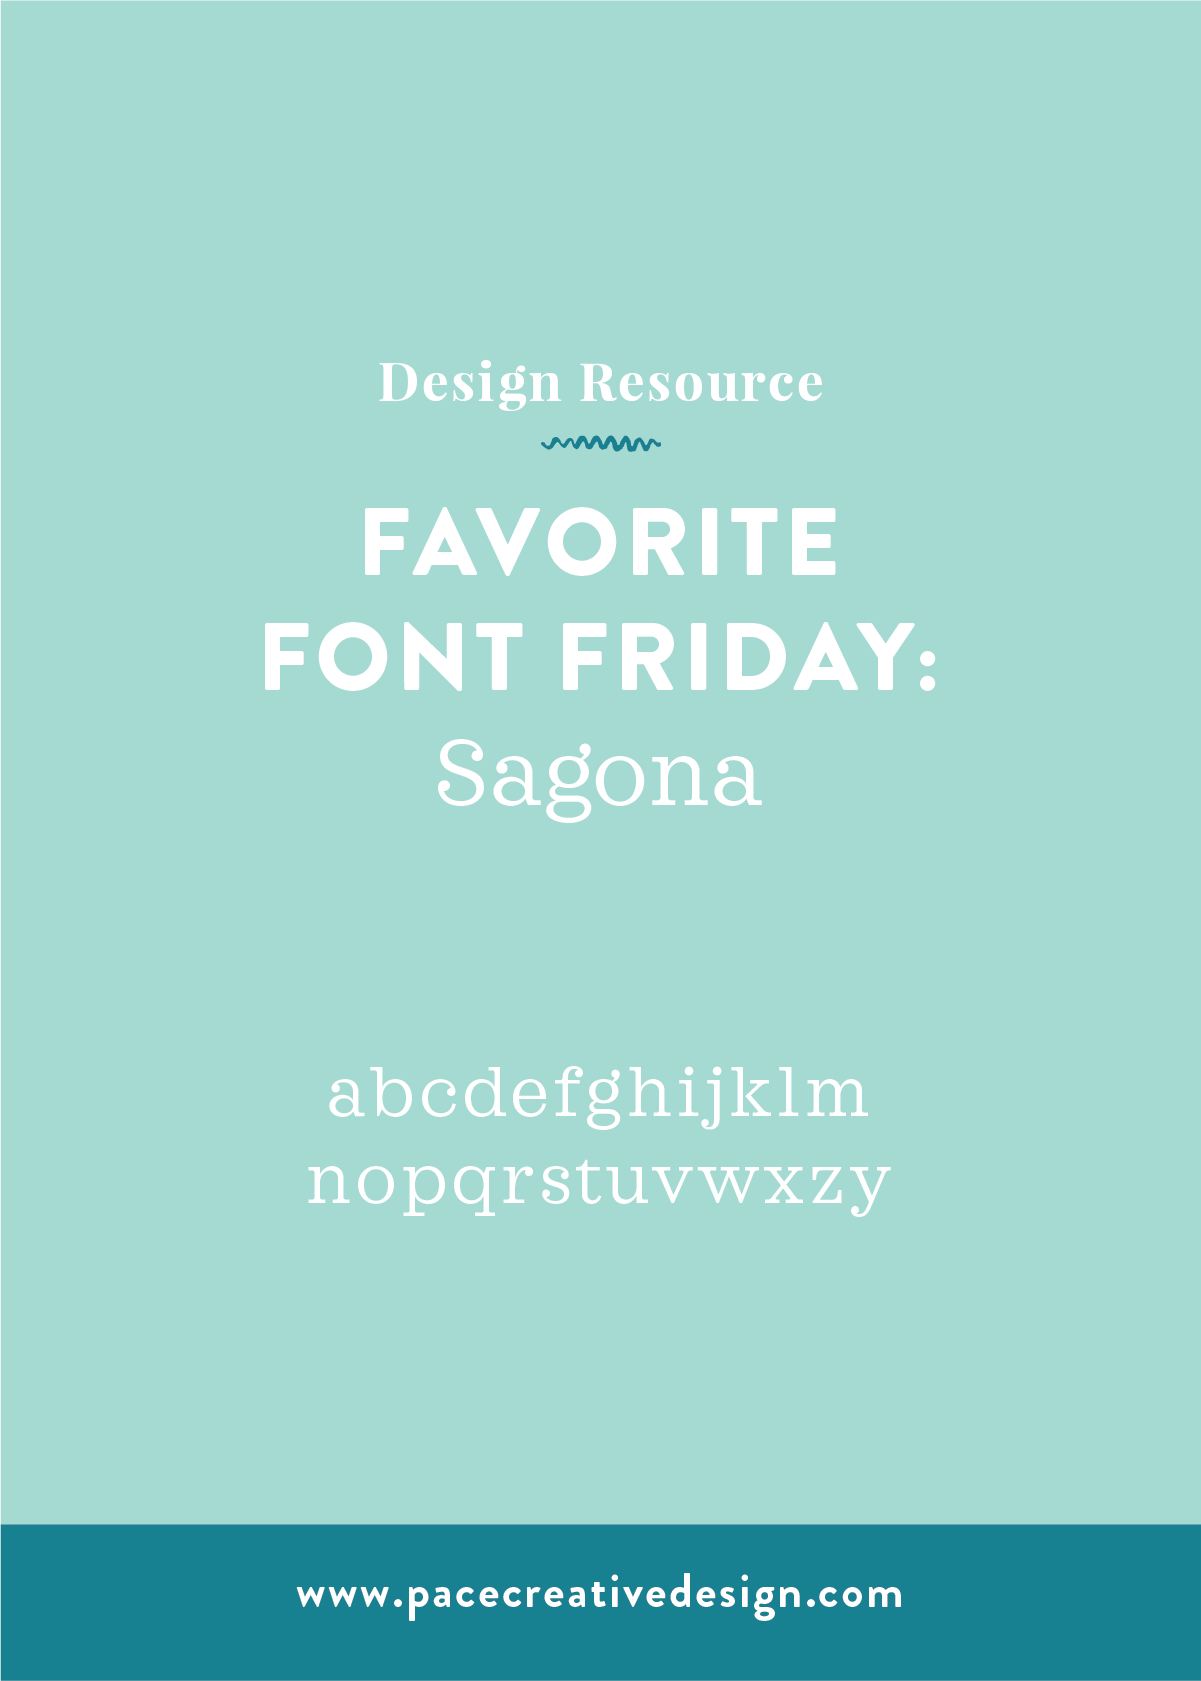 Favorite Font Friday no. 4: Sagona | Pace Creative Design Studio